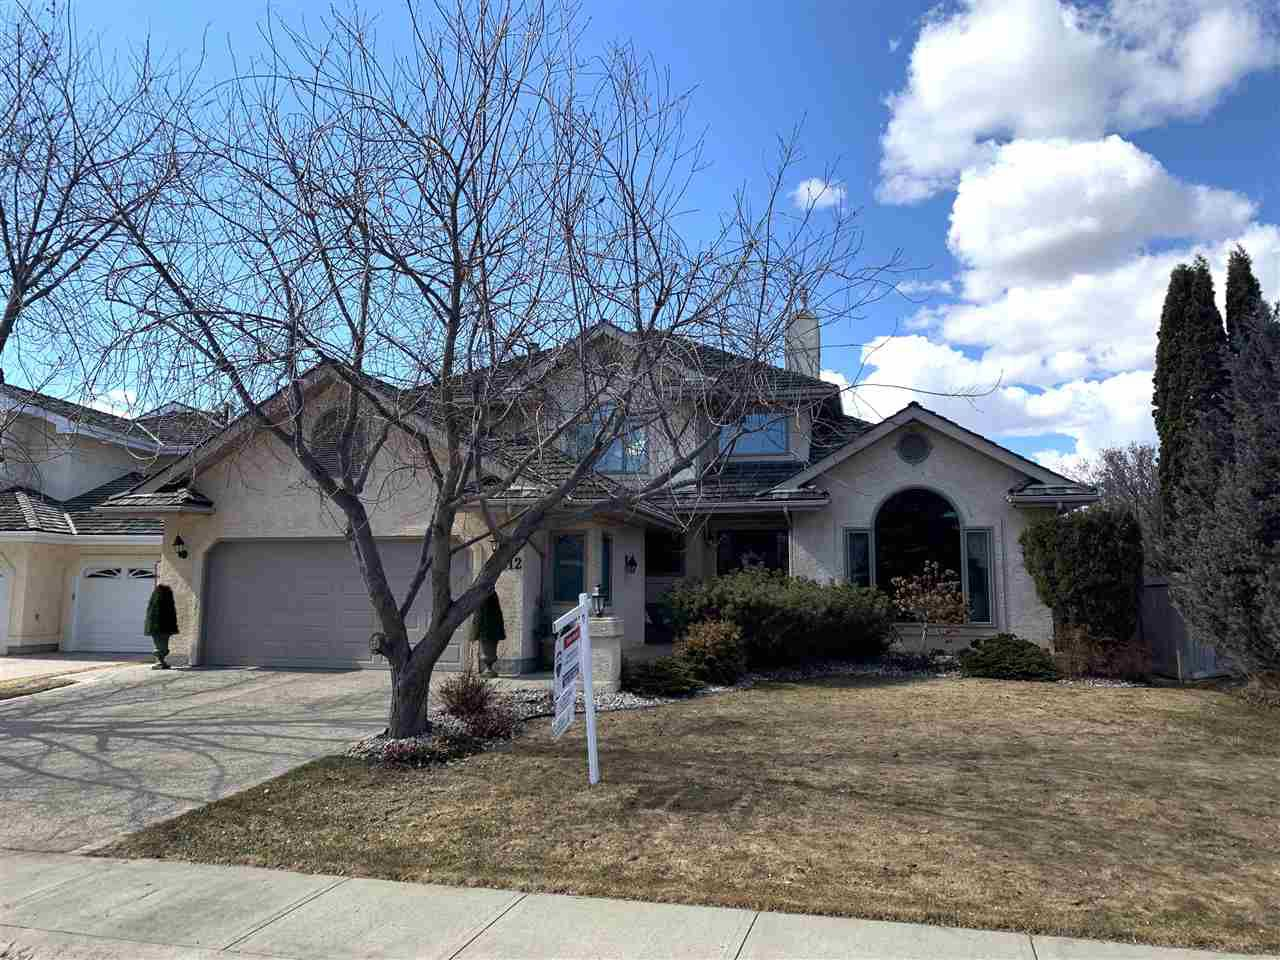 Main Photo: 312 HEDLEY Way in Edmonton: Zone 14 House for sale : MLS®# E4148458